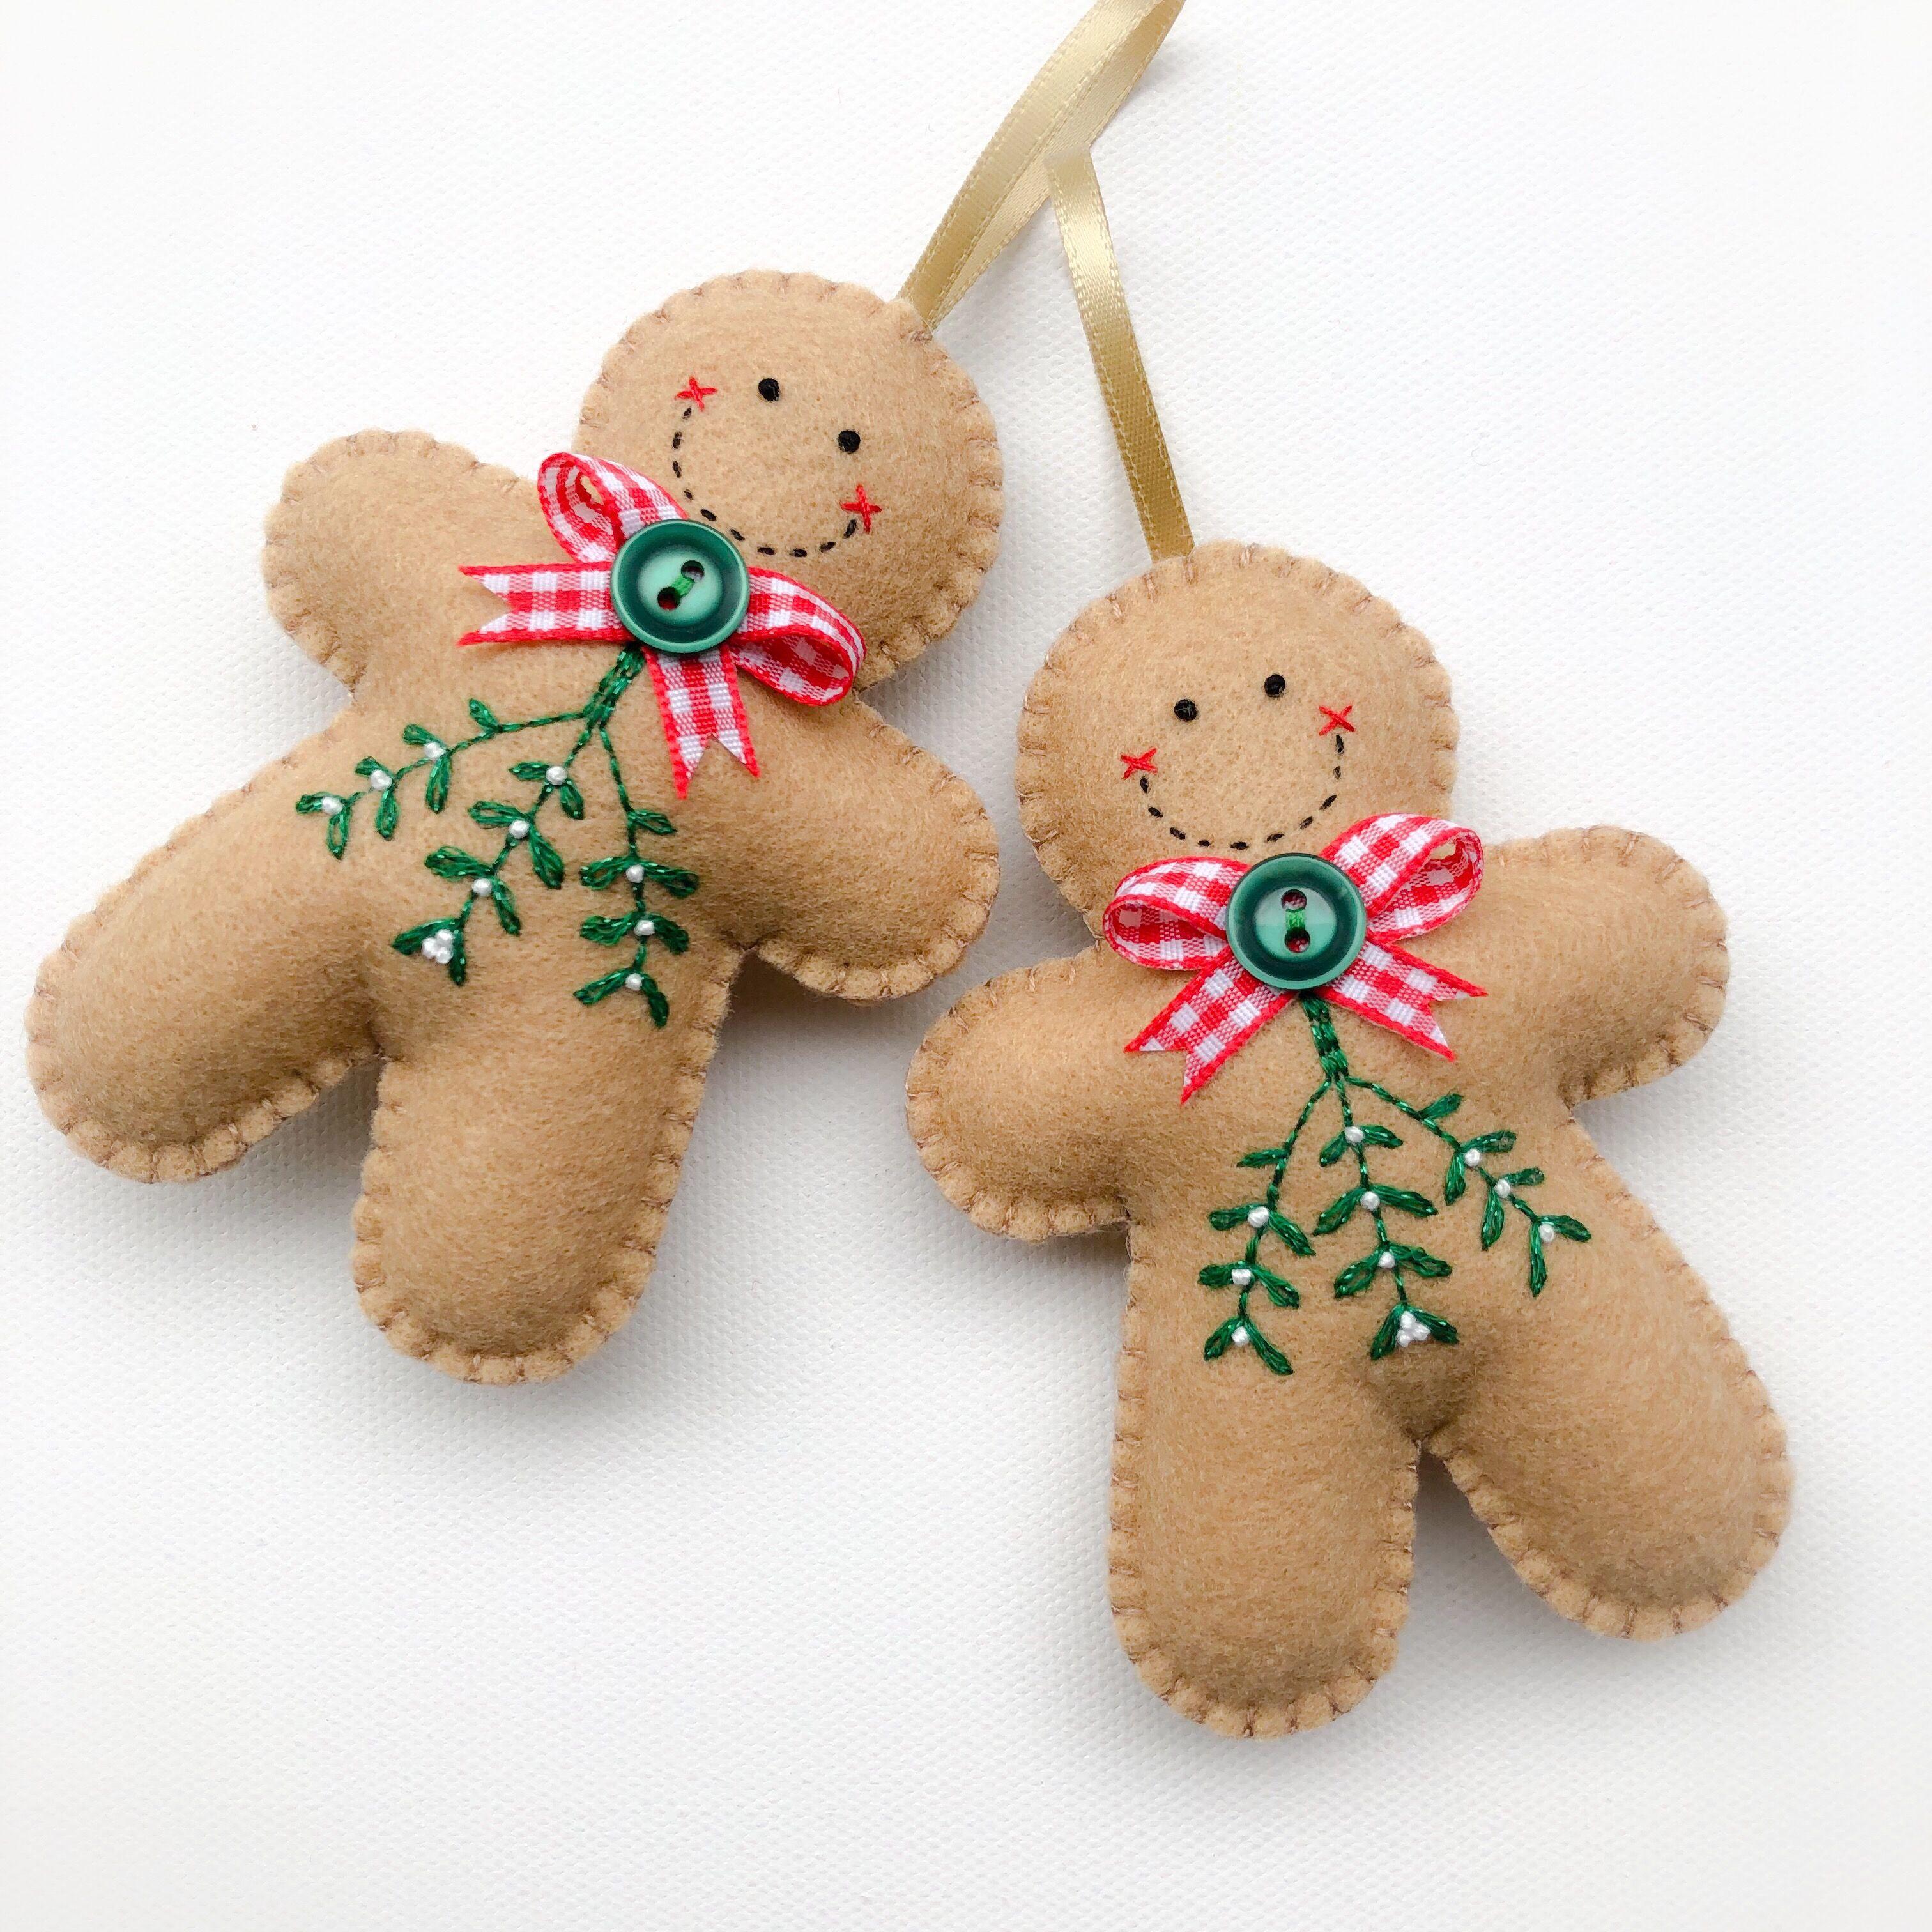 Embroidered Felt Gingerbread Man Christmas Decoration Felt Crafts Christmas Diy Felt Christmas Ornaments Felt Christmas Ornaments